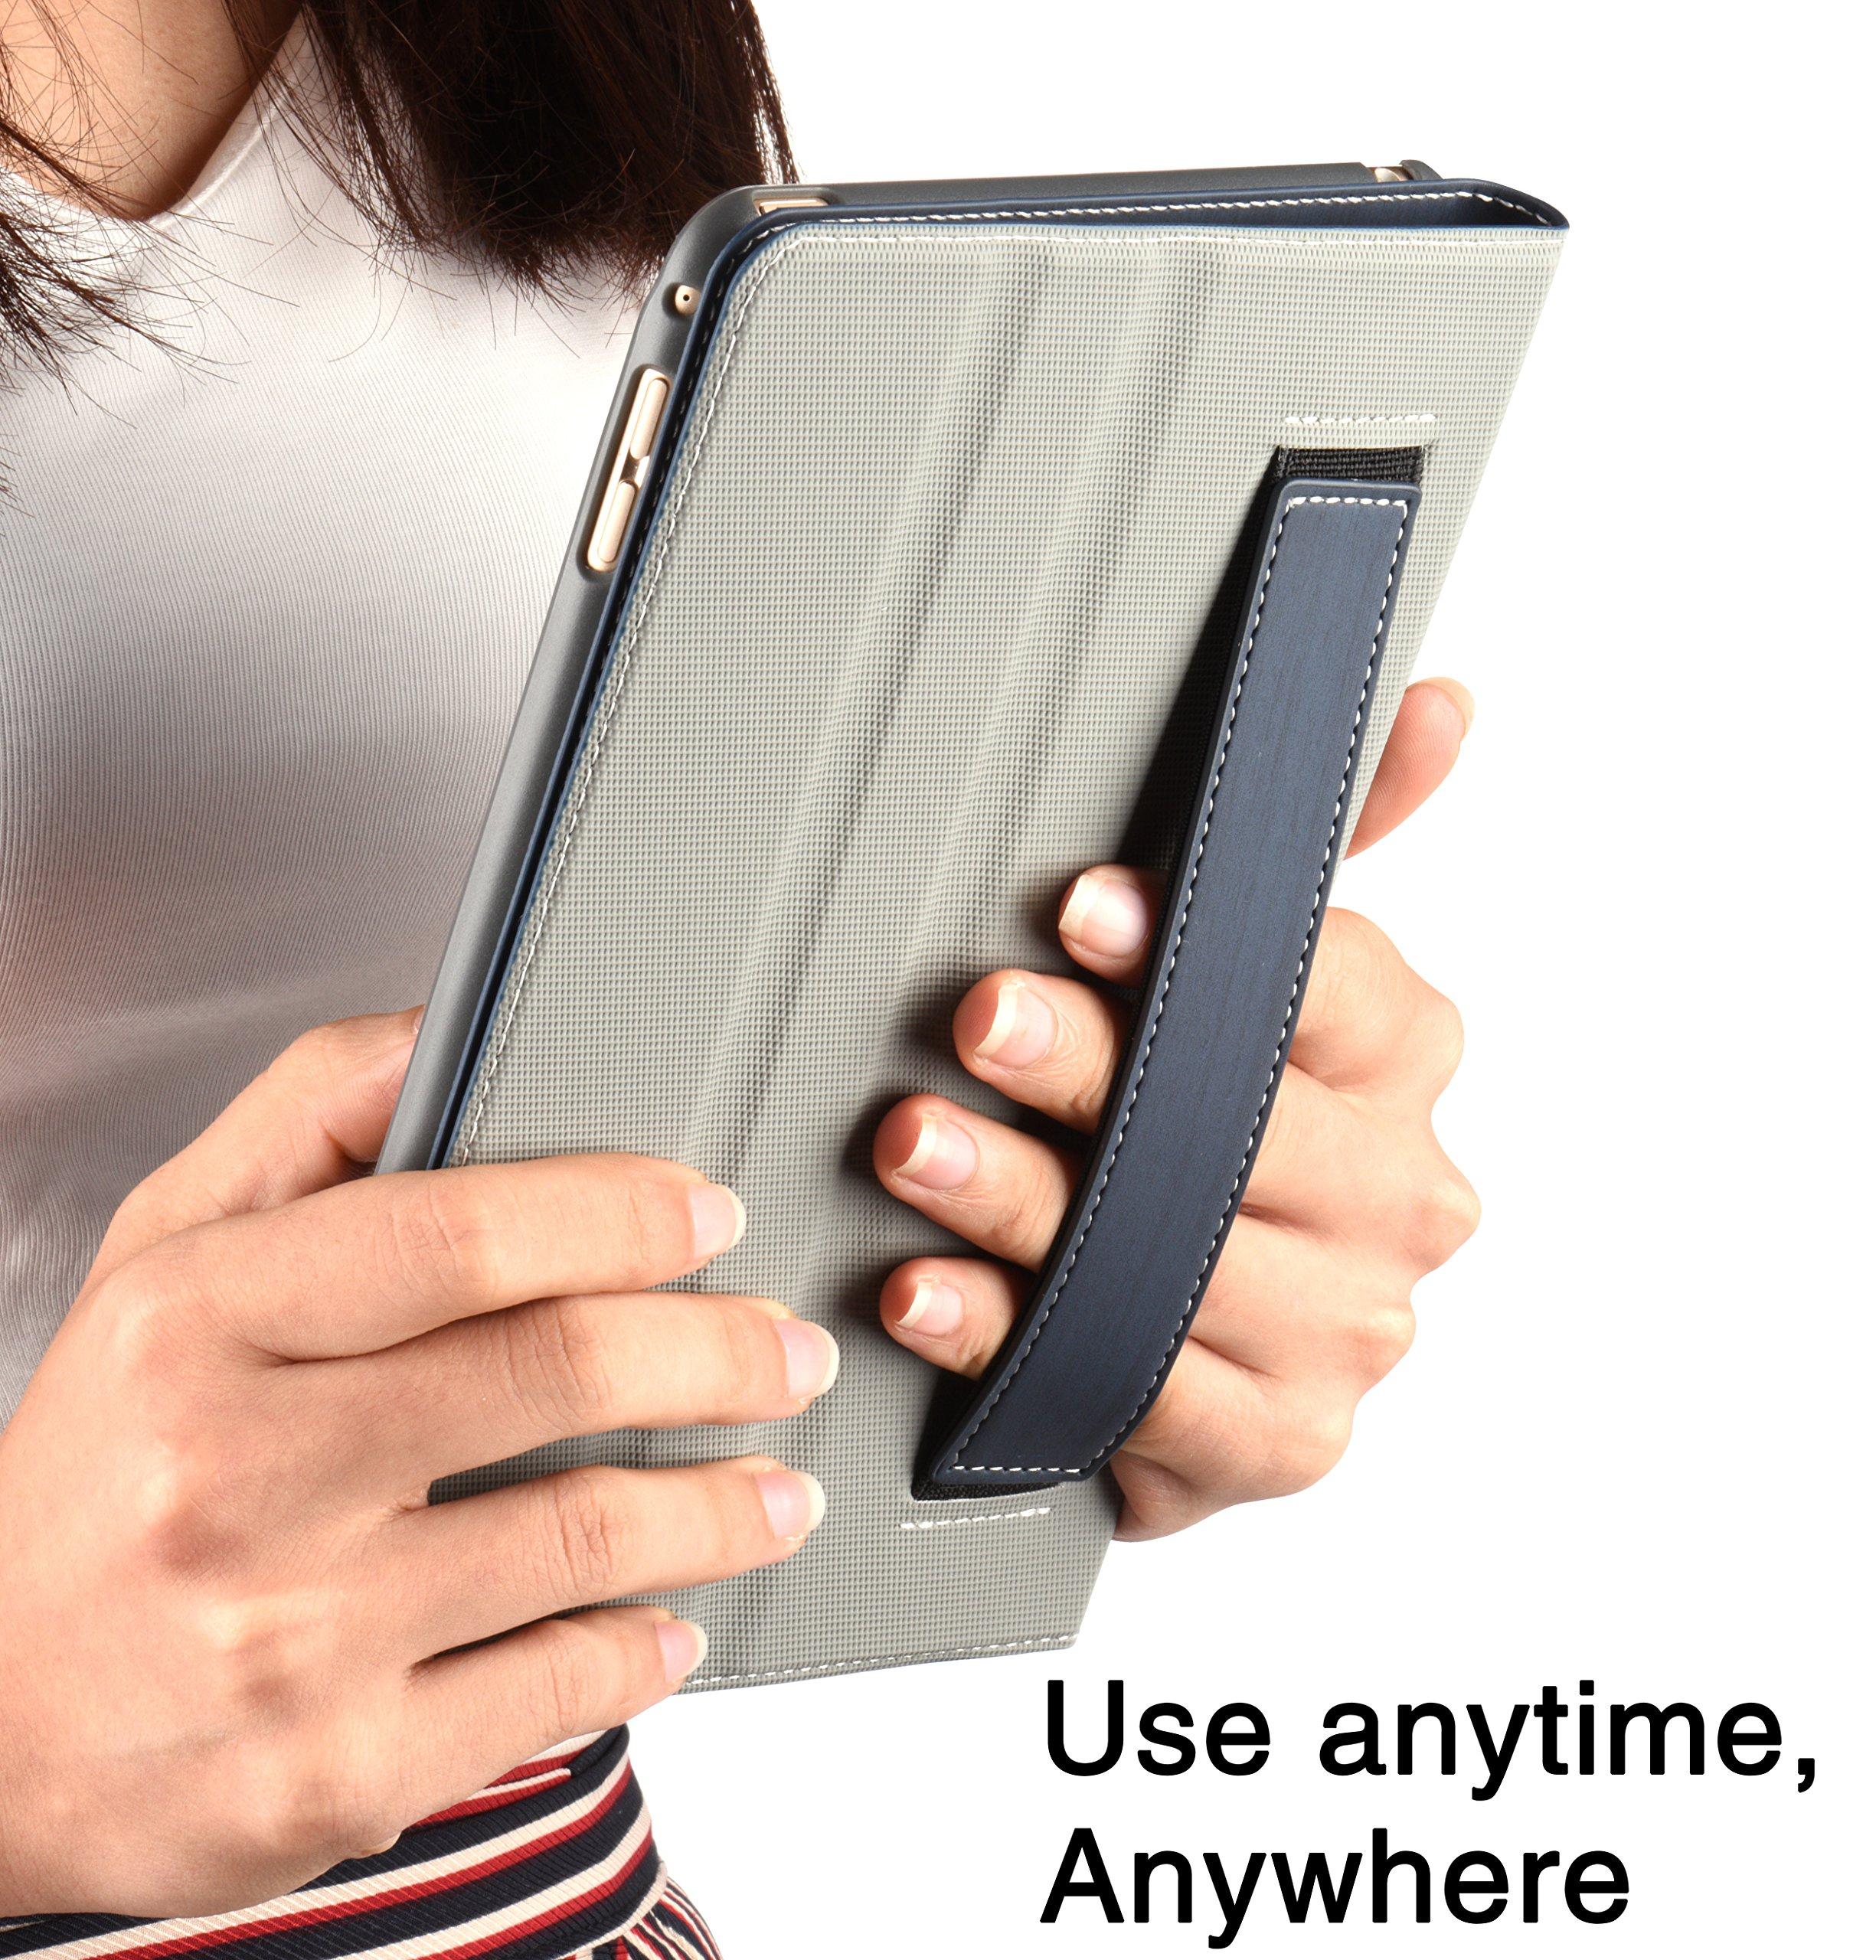 ipad Pro 10,5 Hülle Dimi Apple ipad Pro 10,5 case,Hülle für iPad Pro 10,5 Ultra Shell Cover PU Leder Leder Tasche Schutzhülle für Apple iPad Pro 10,5\